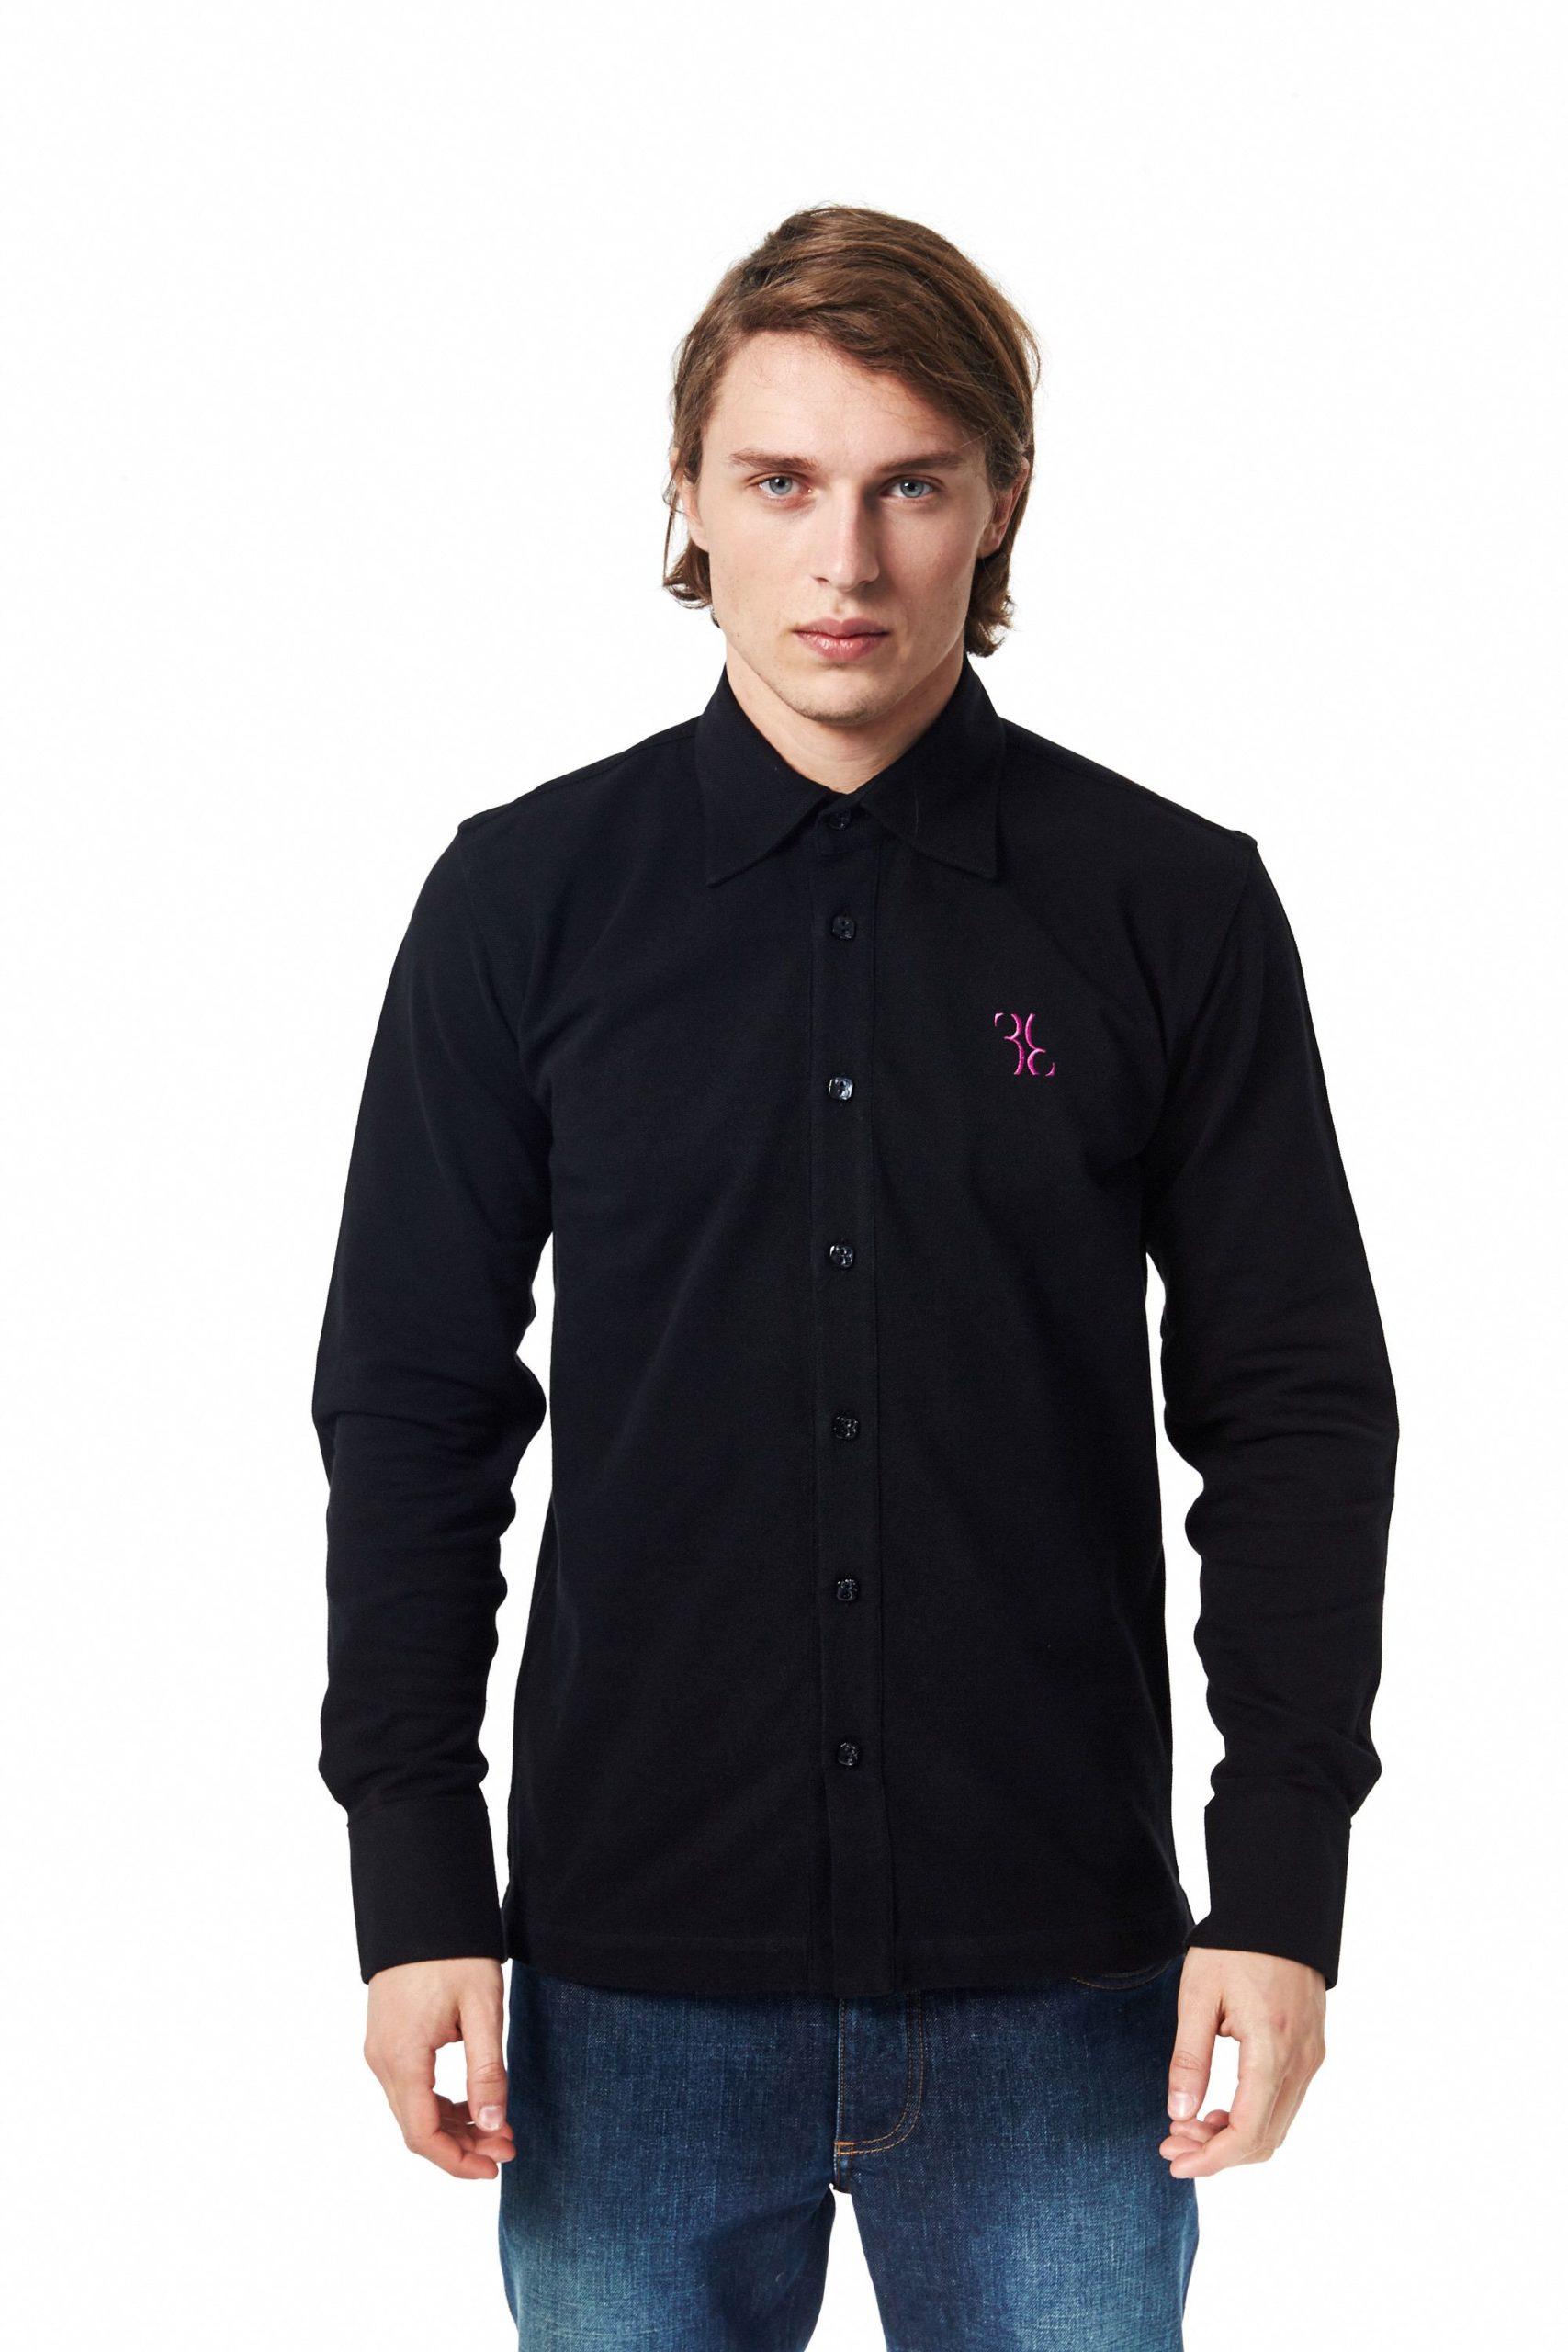 Billionaire Italian Couture Men's Shirt Black BI1394672 - XS